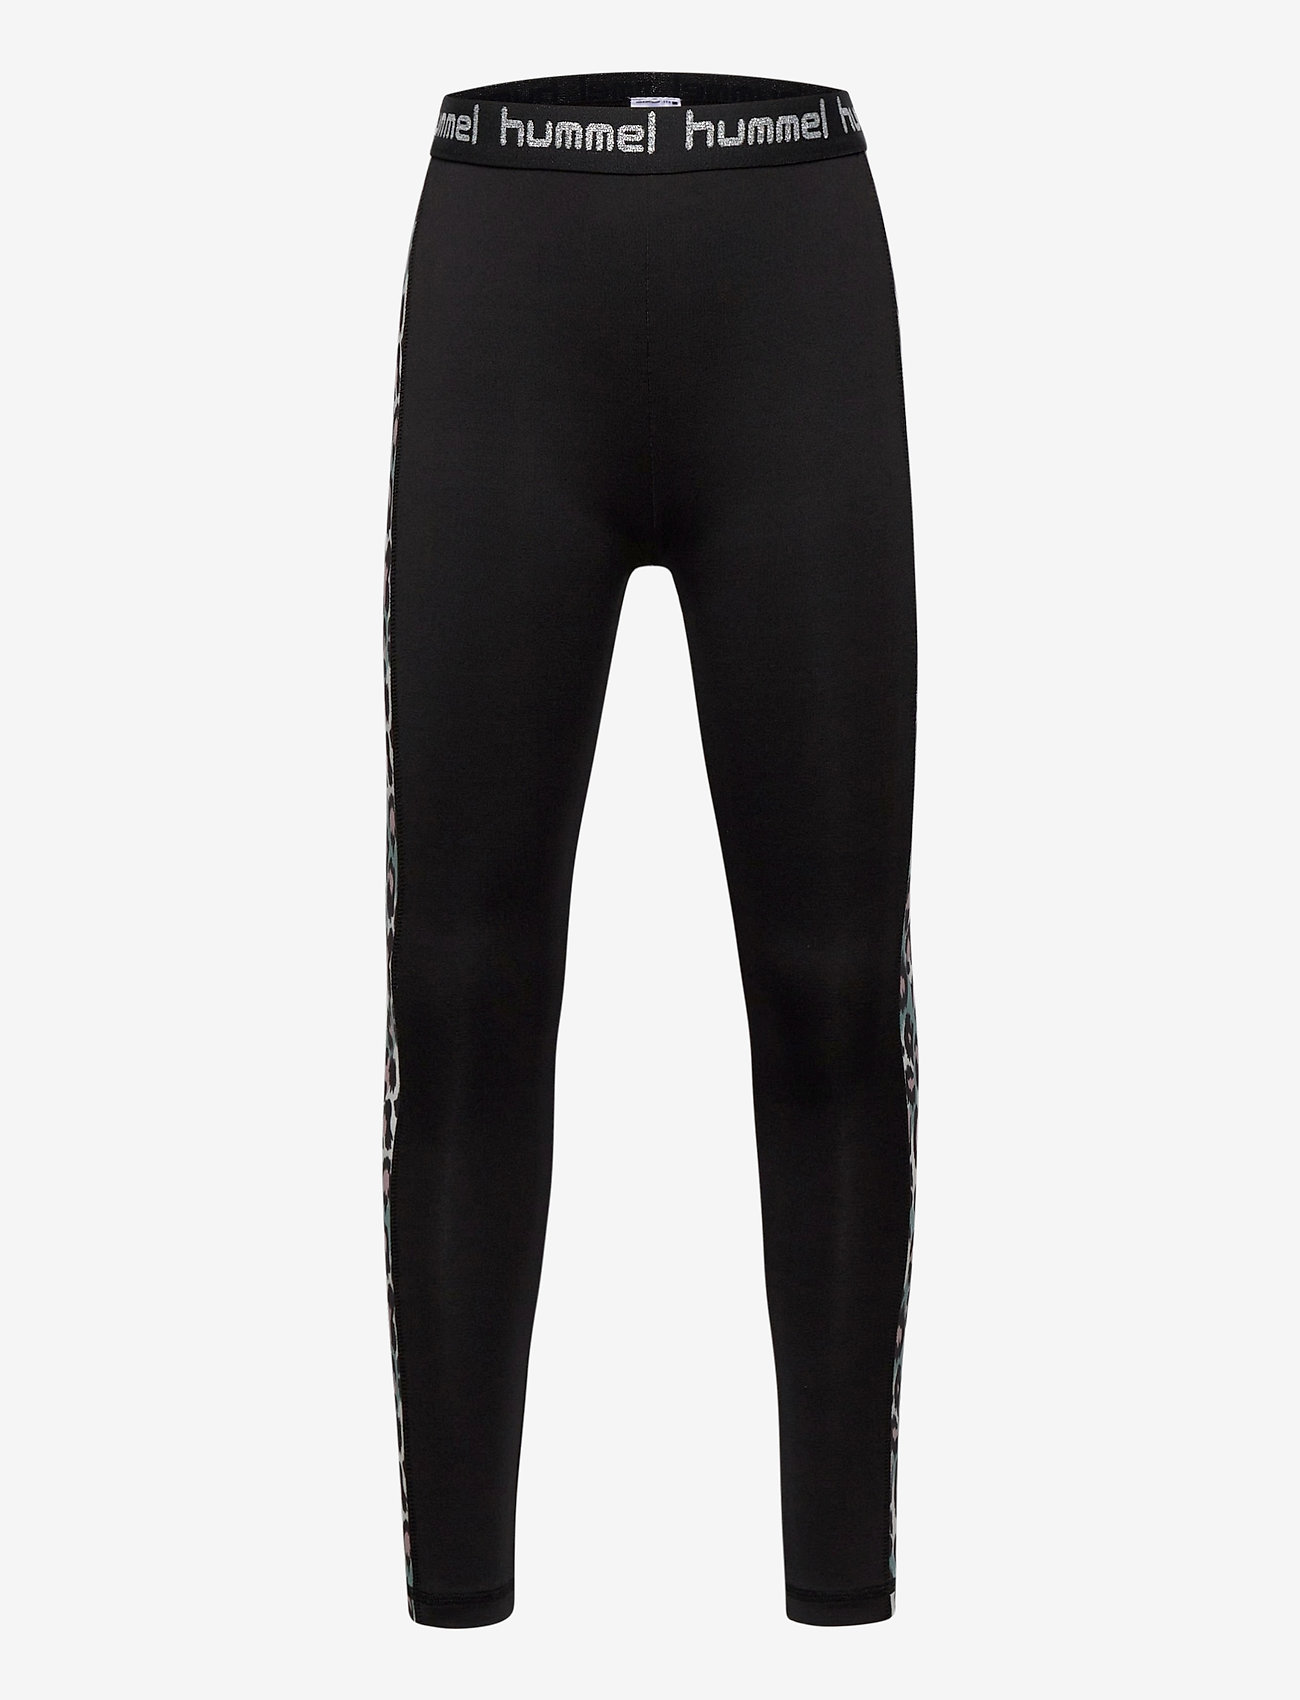 Hummel - hmlNANNA TIGHTS - leggings - black - 0